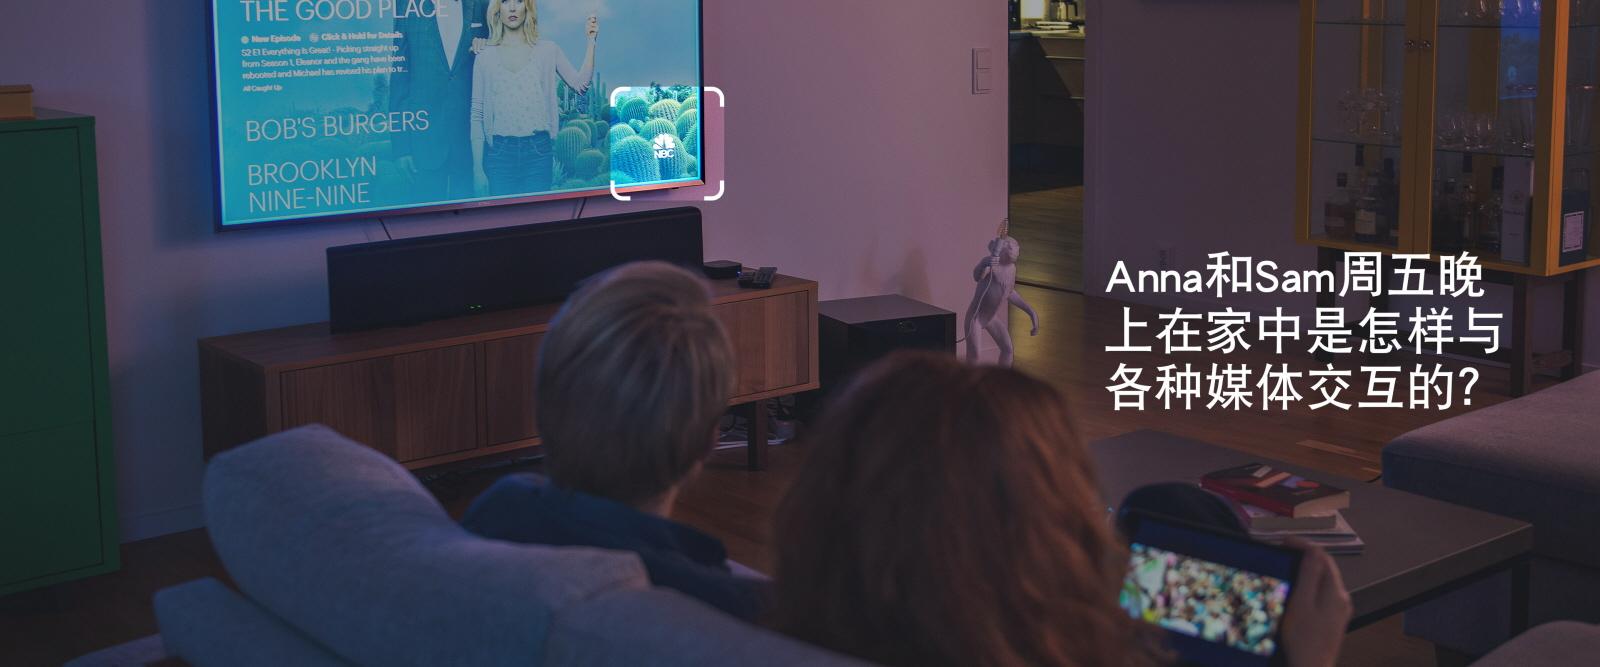 Tobii Pro Insight-Media Consumption